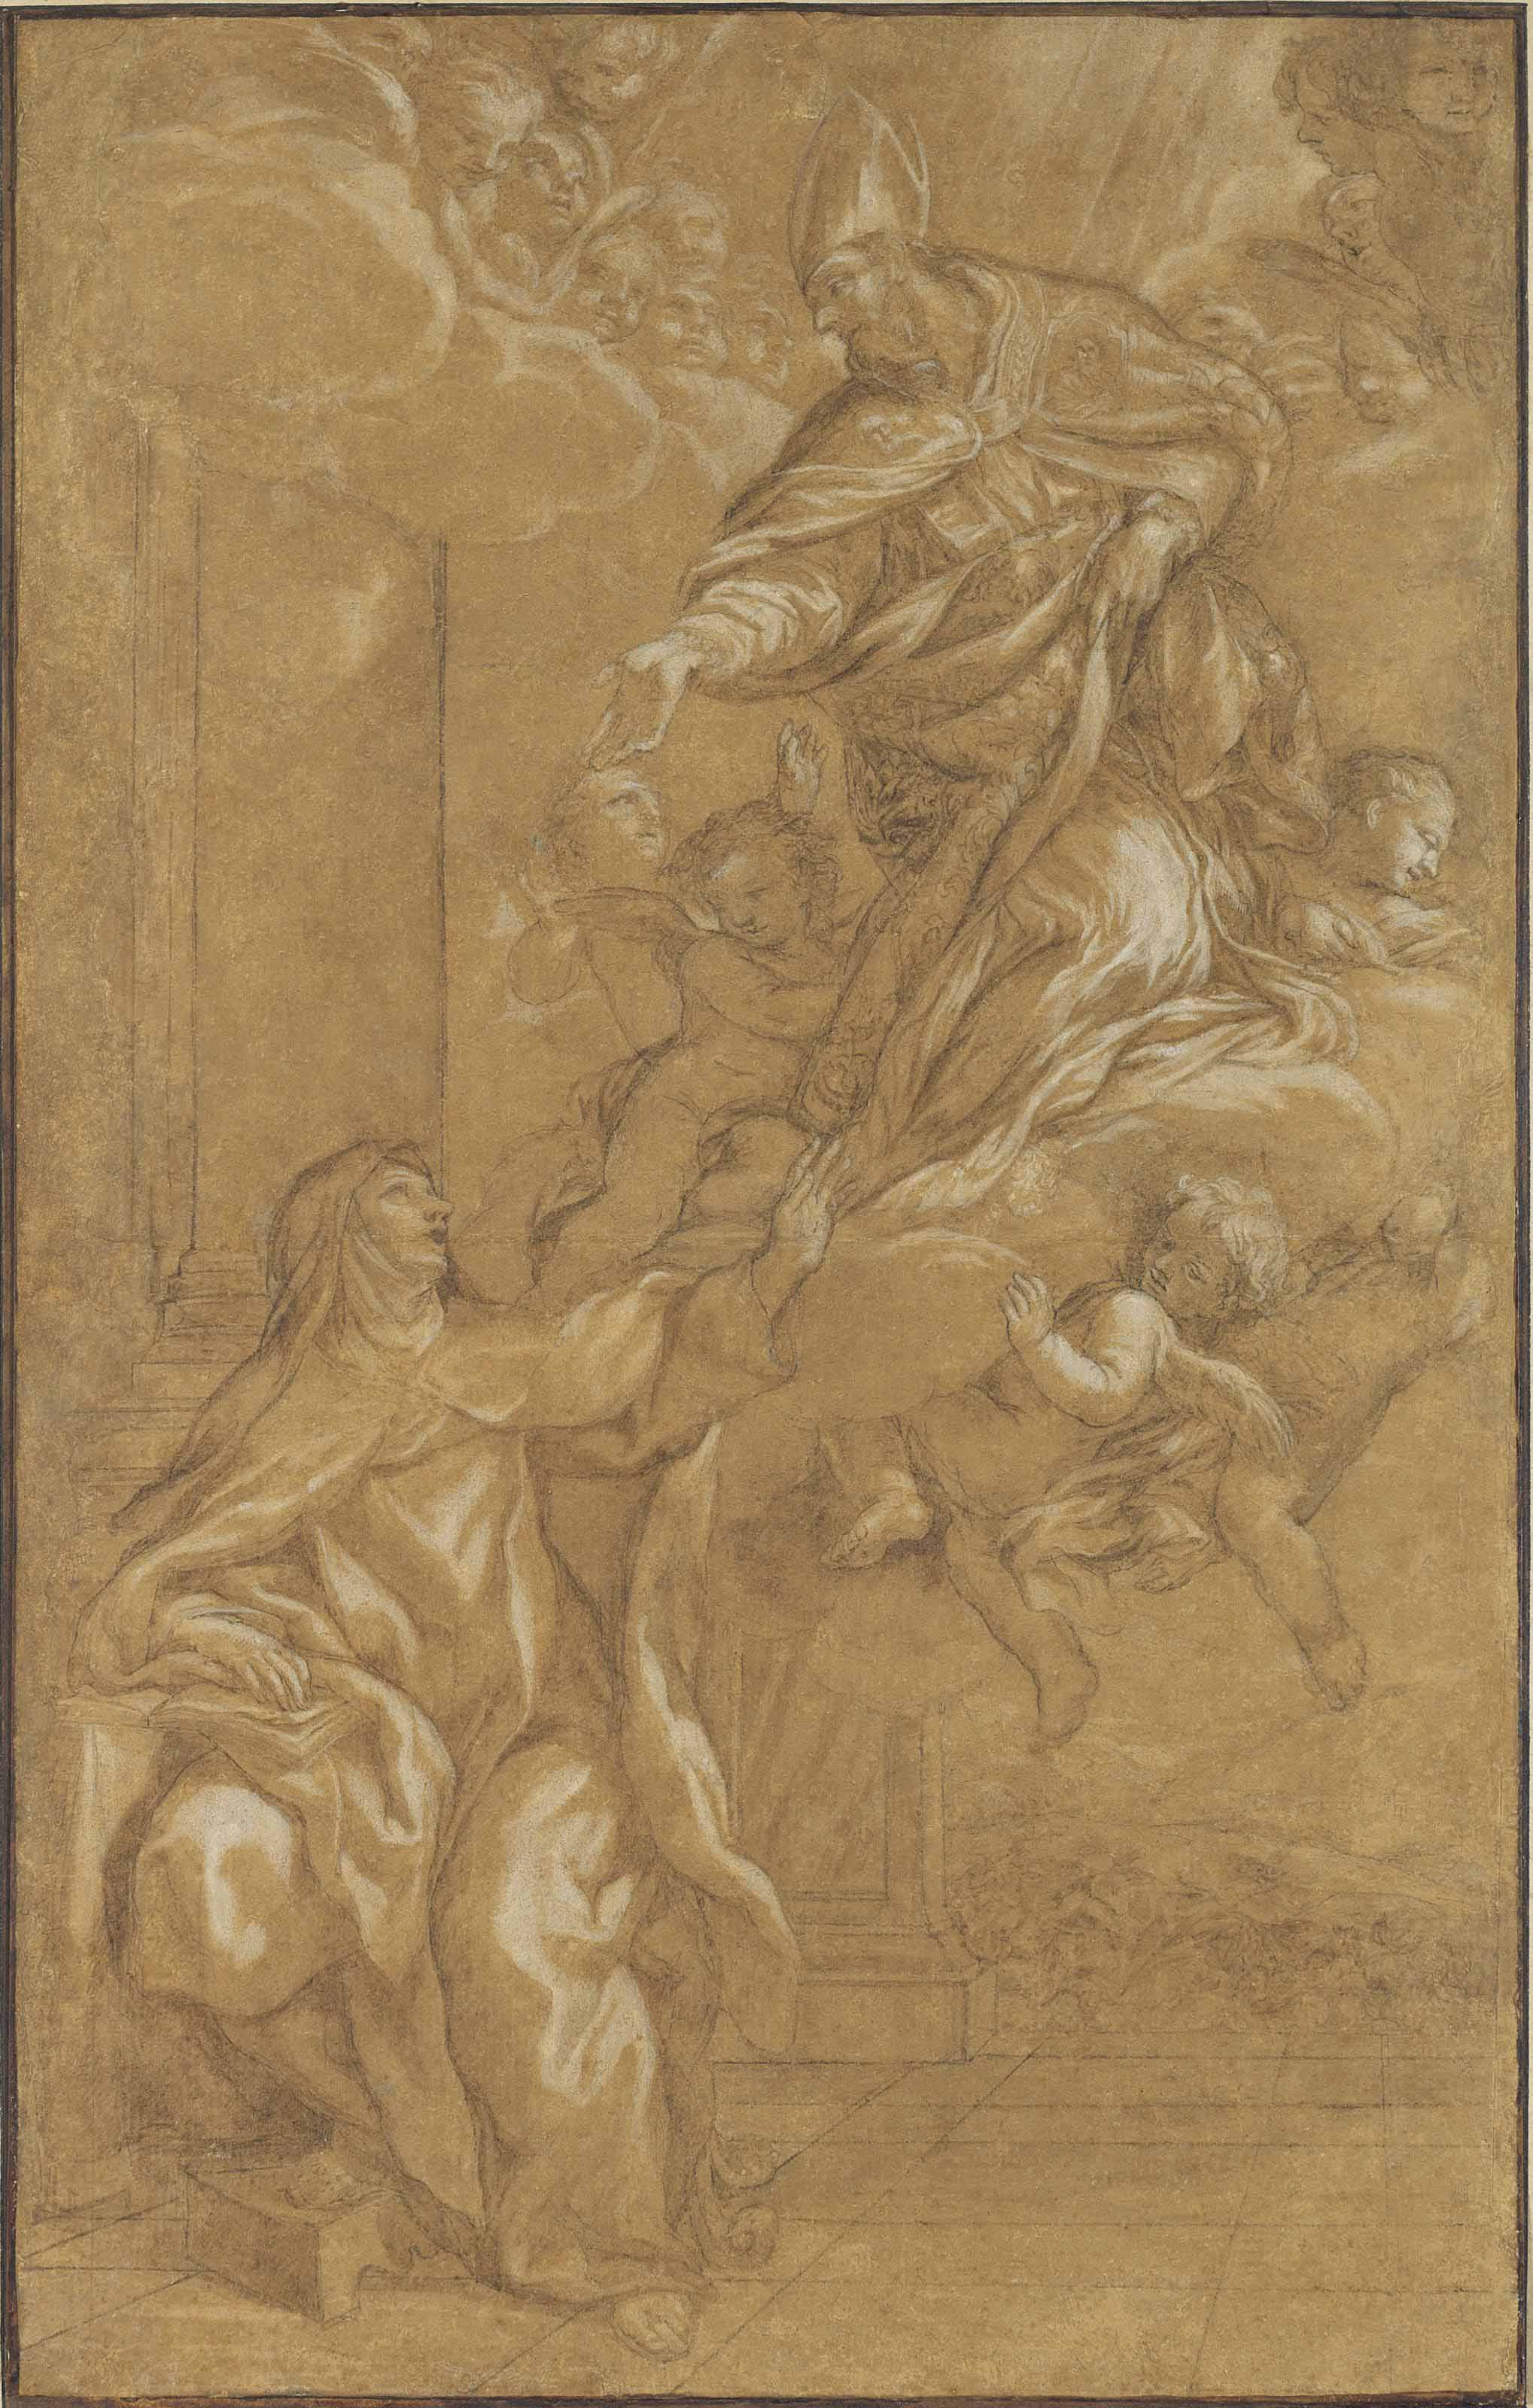 Saint Augustine appearing to Saint Teresa of Ávila